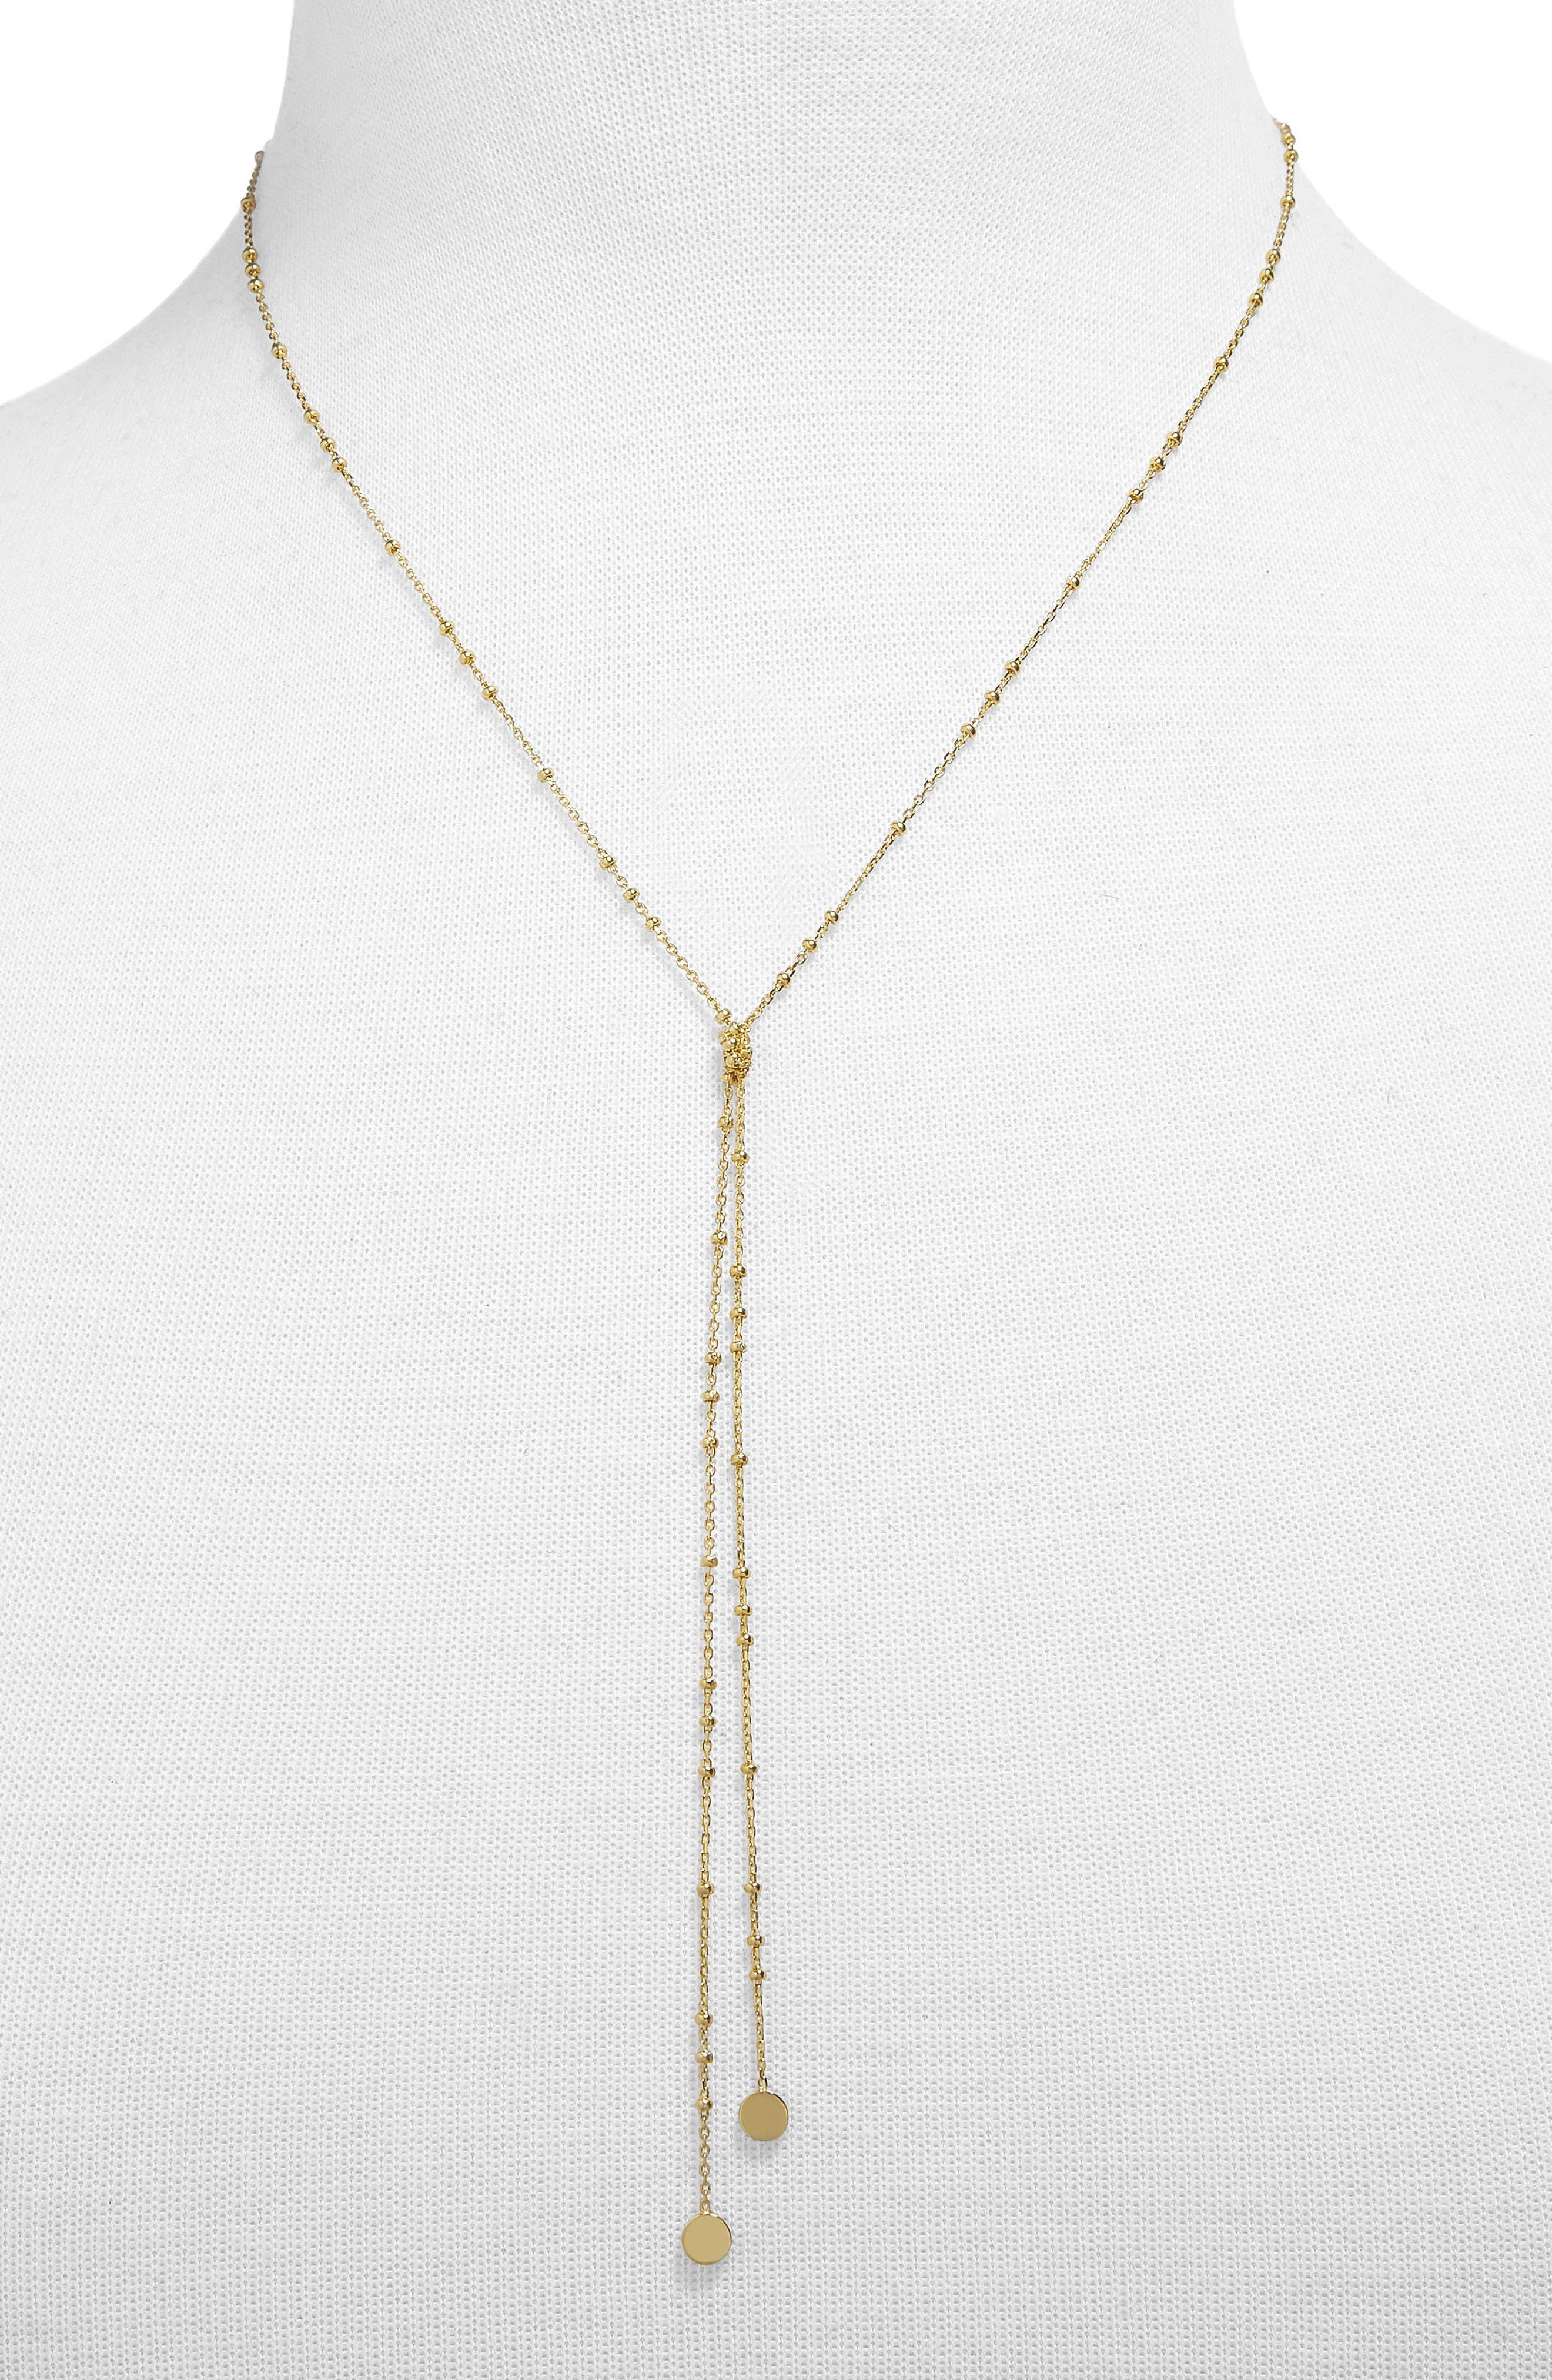 Palla Lariat Necklace,                             Main thumbnail 1, color,                             Gold